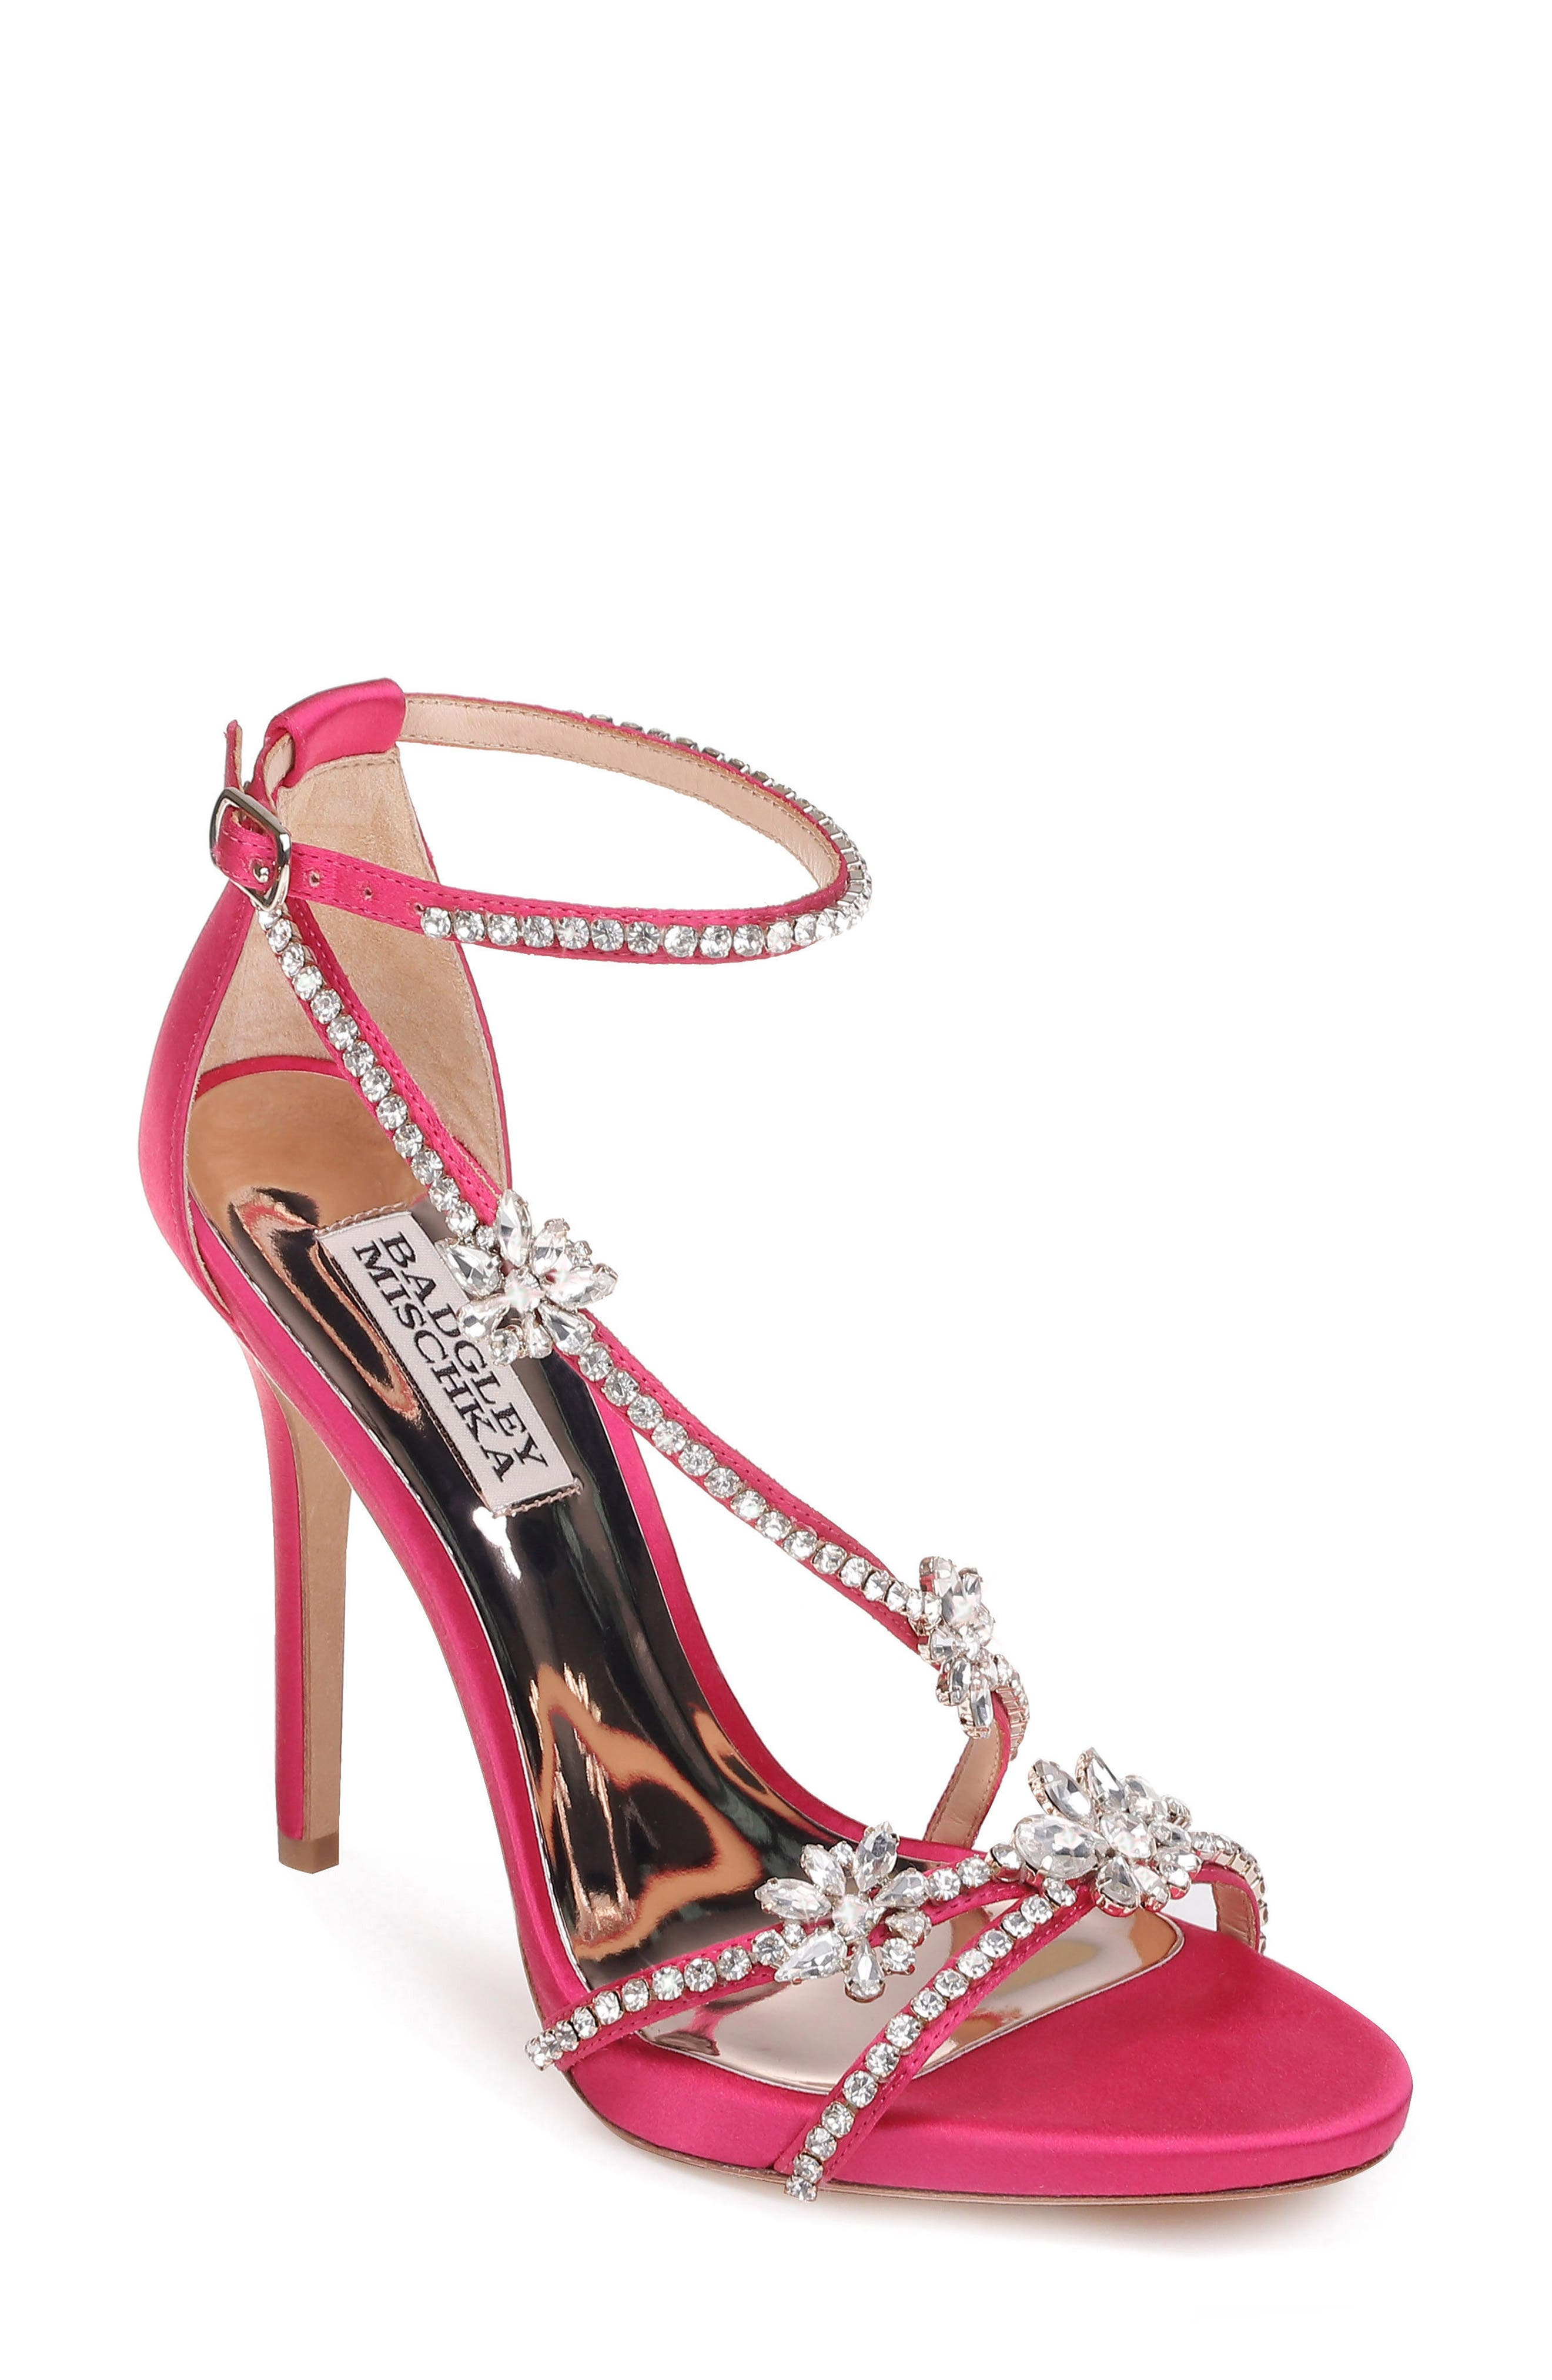 Badgley Mischka Hodge Strappy Sandal, Pink